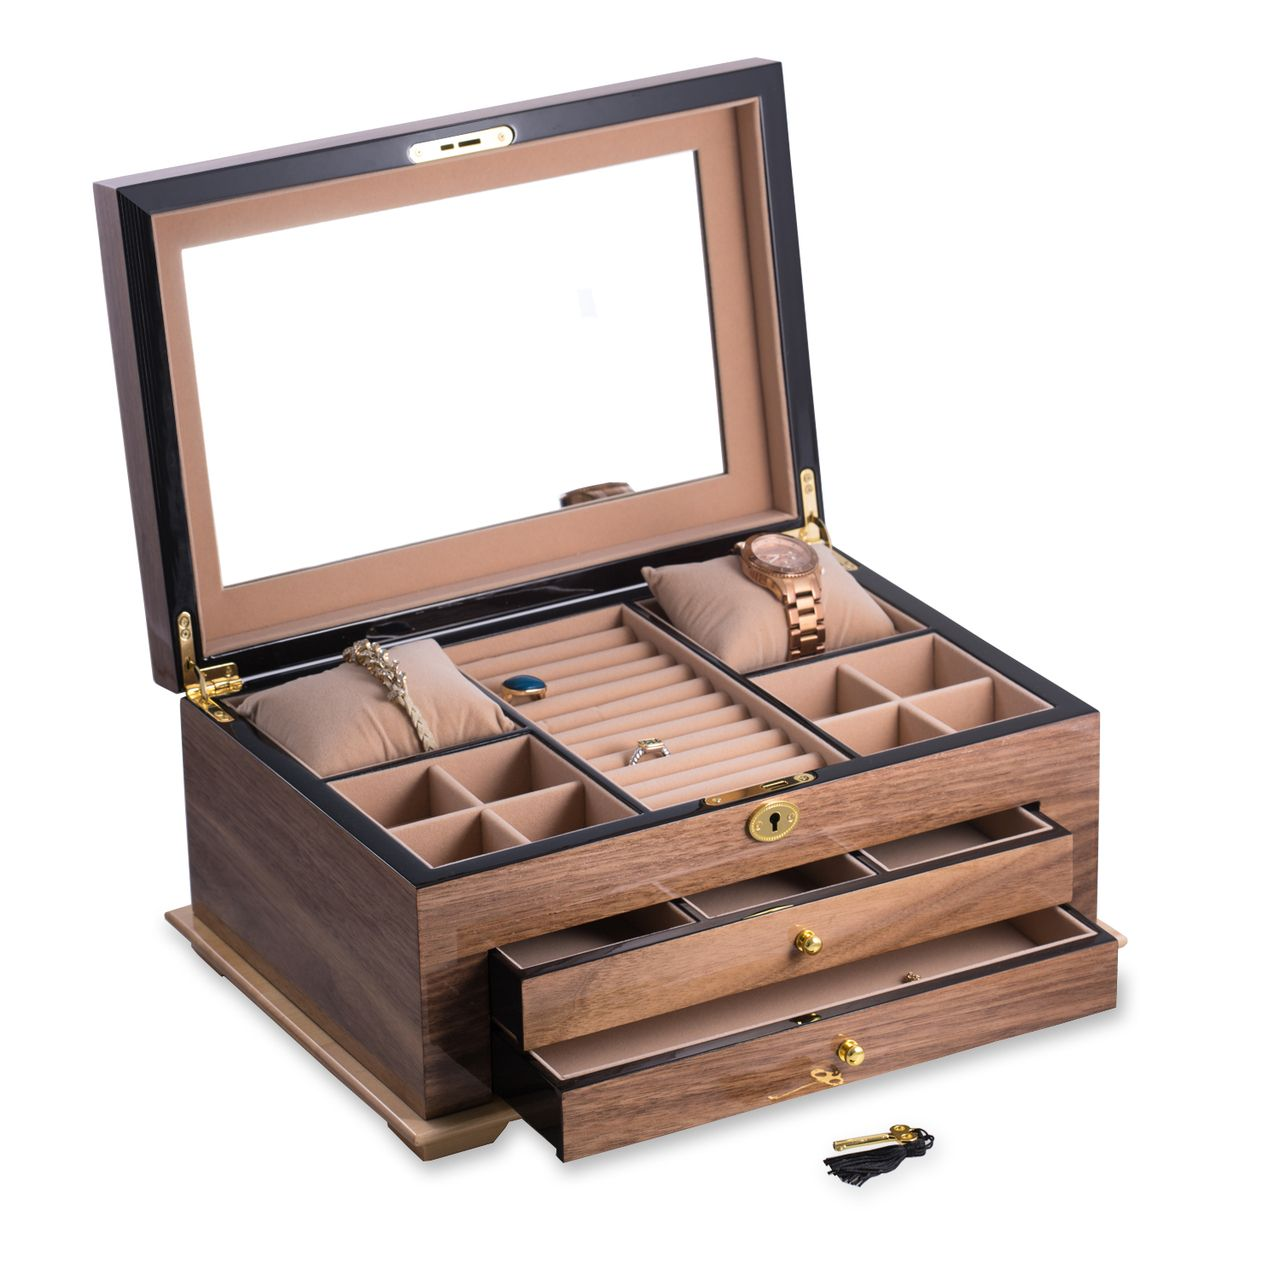 Bb670brw Watches Jewelry Box Home Decor Baskets